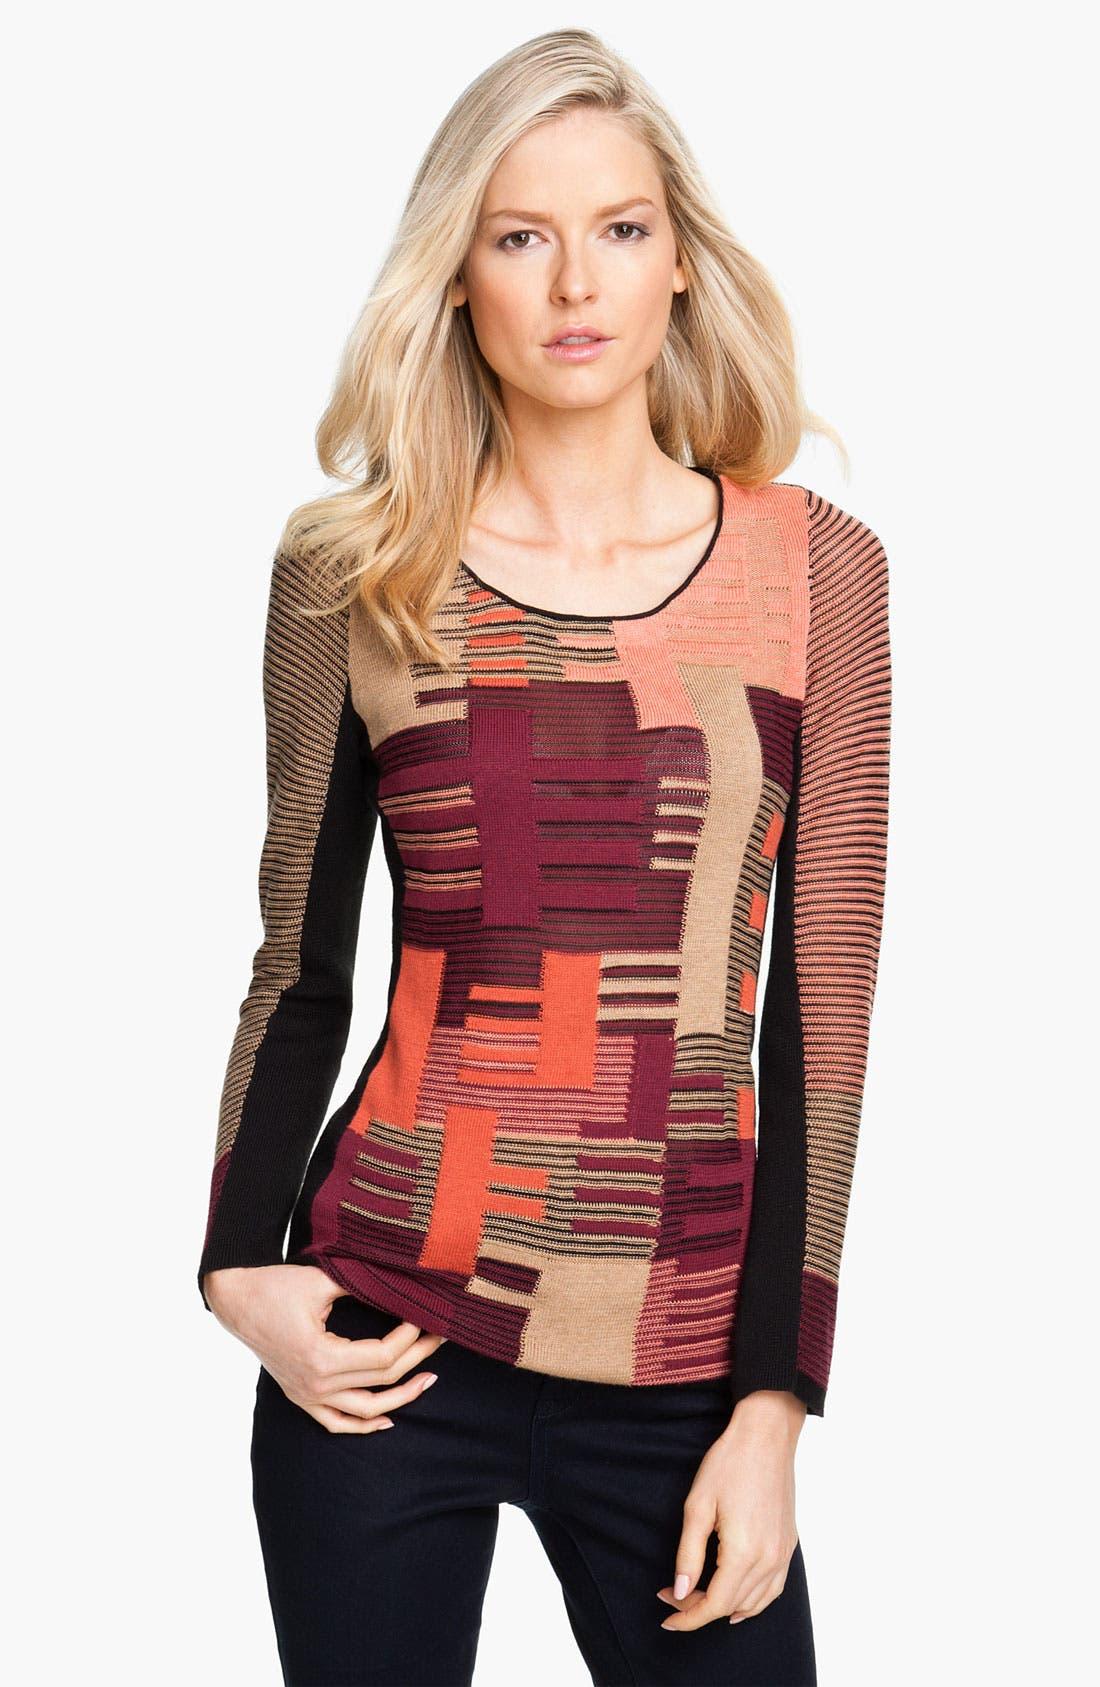 Alternate Image 1 Selected - Nic + Zoe 'Puzzle' Sweater